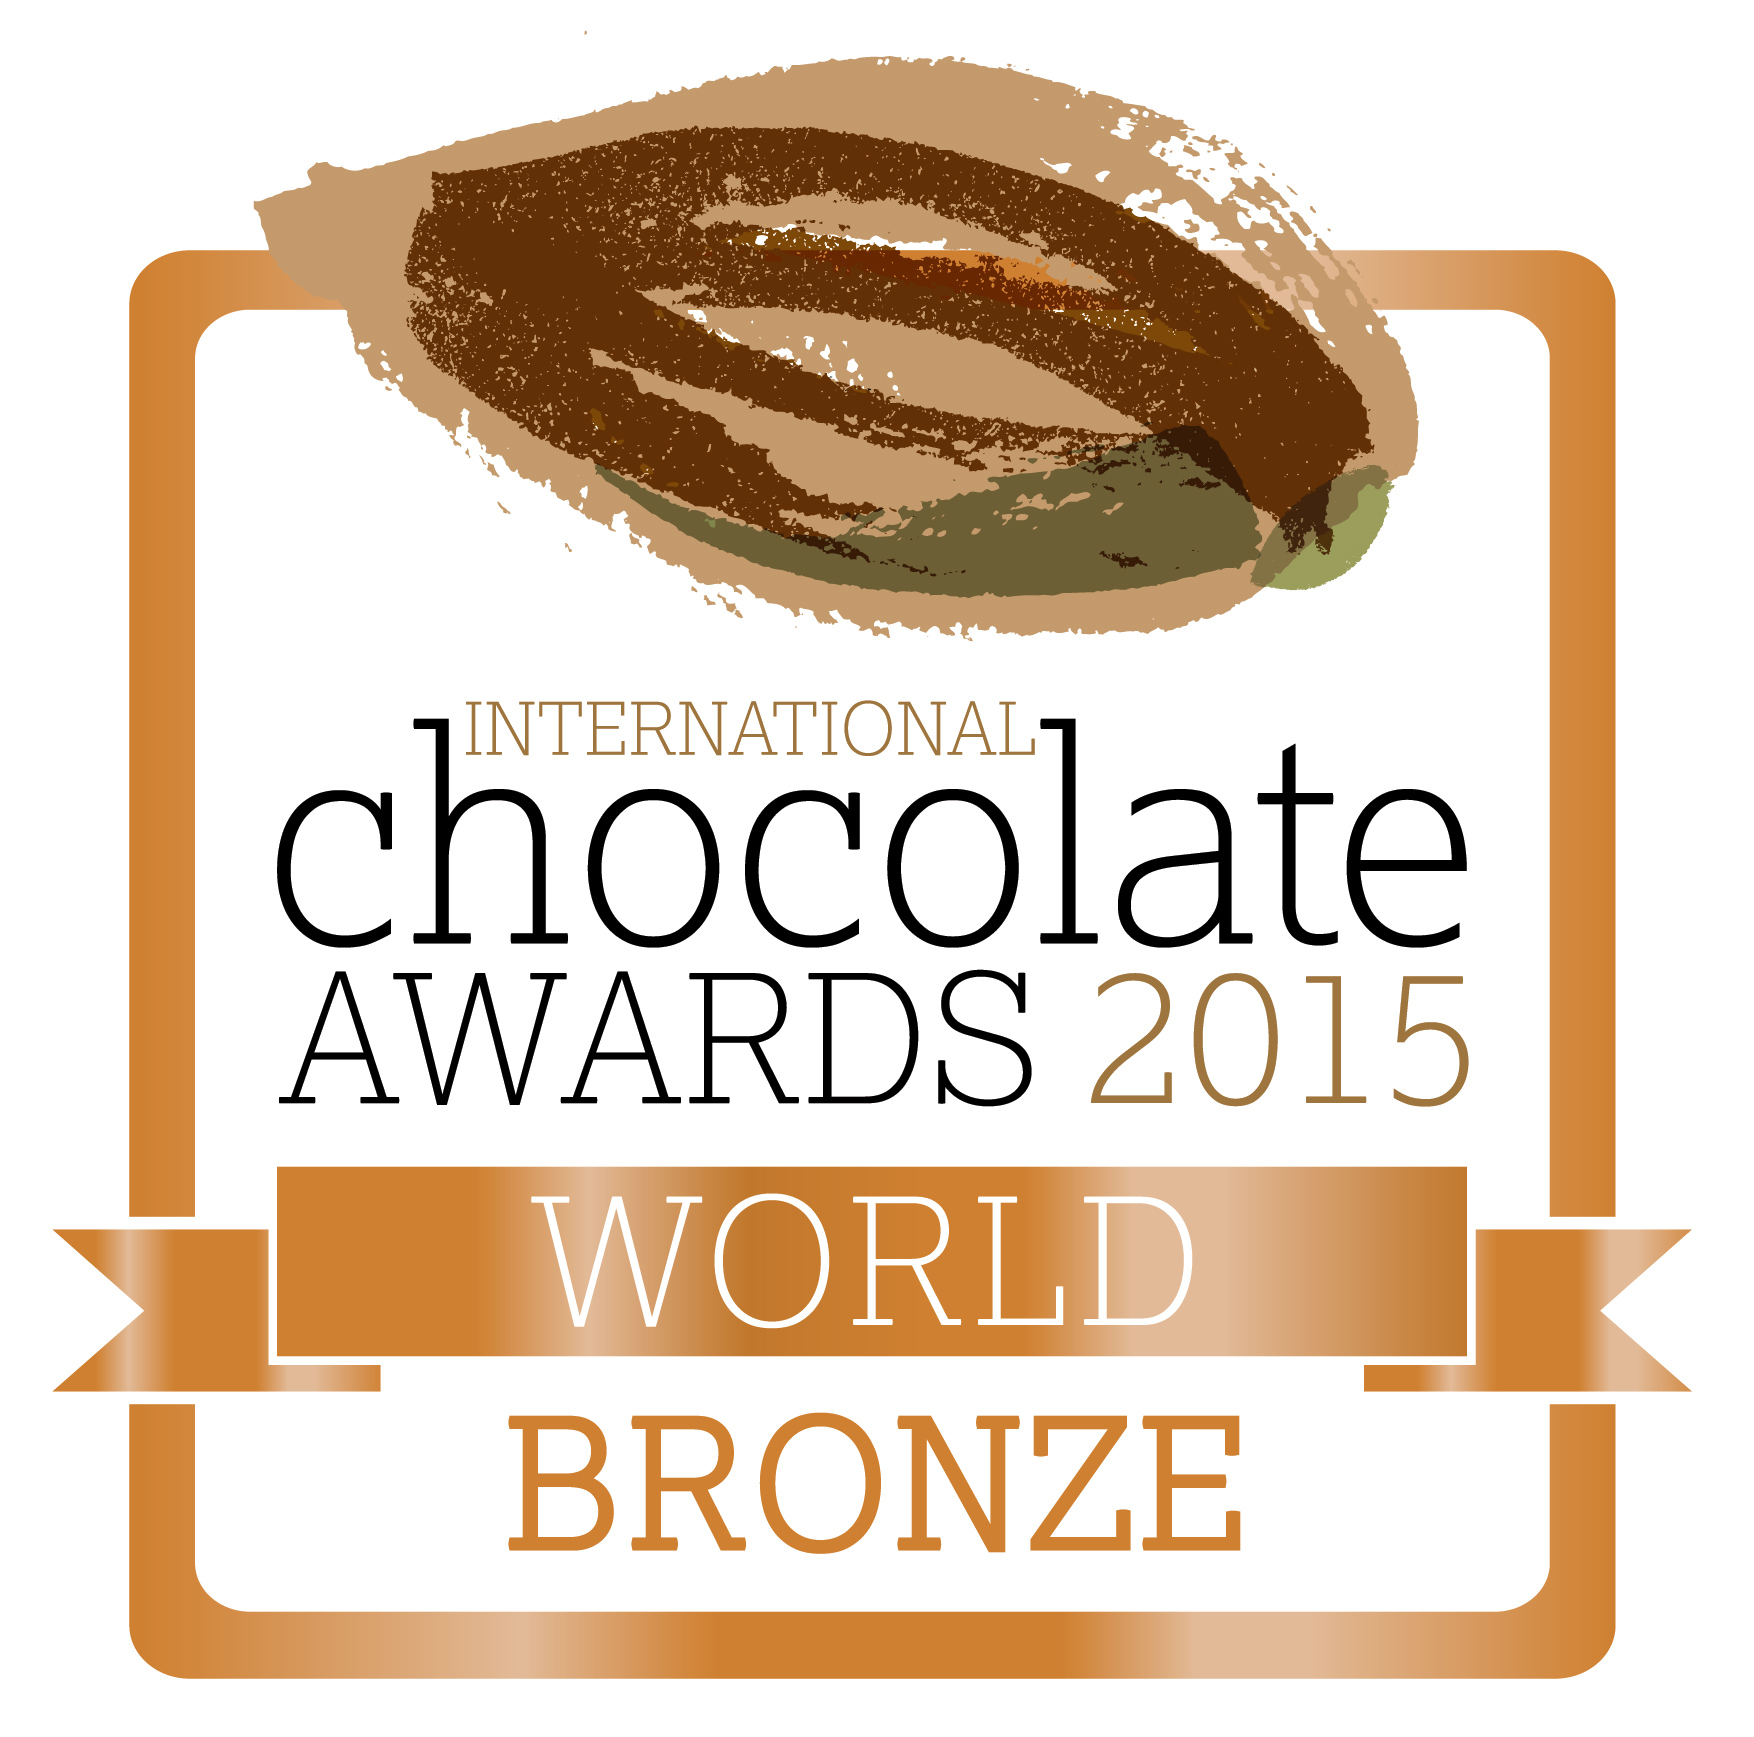 International Chocolate Awards 2015 - Bronze - World RGB - web.jpg